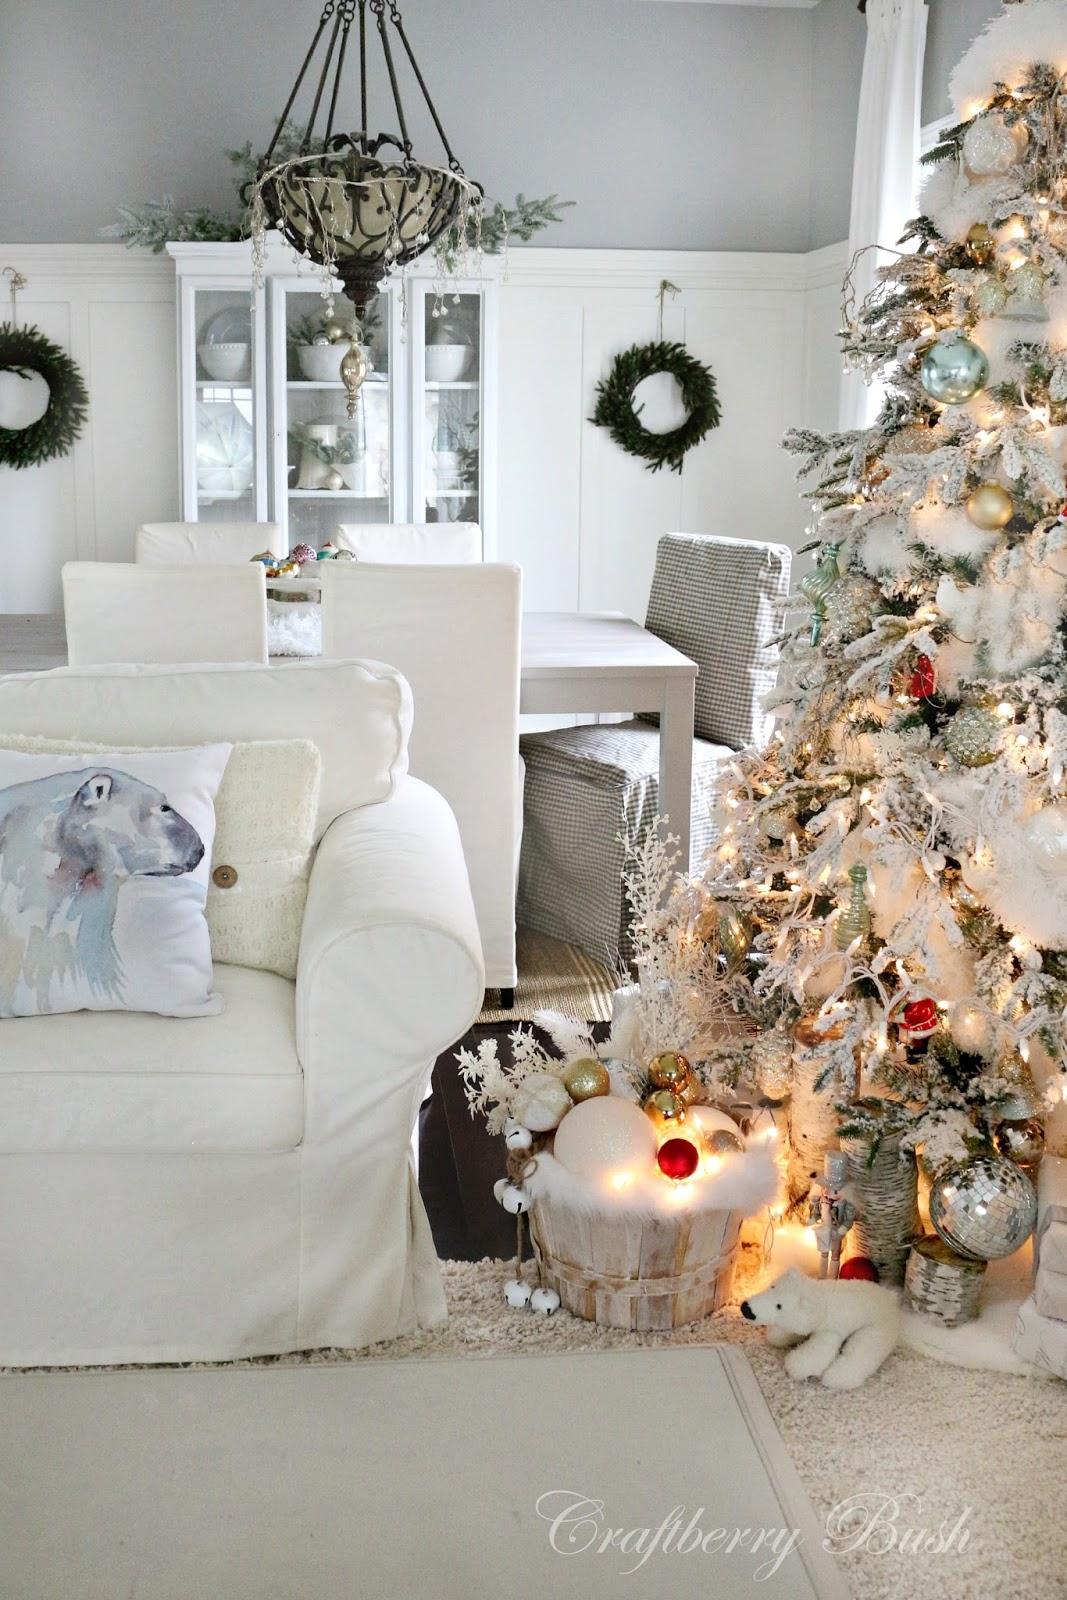 Christmas Home Decor Ideas - The 36th AVENUE